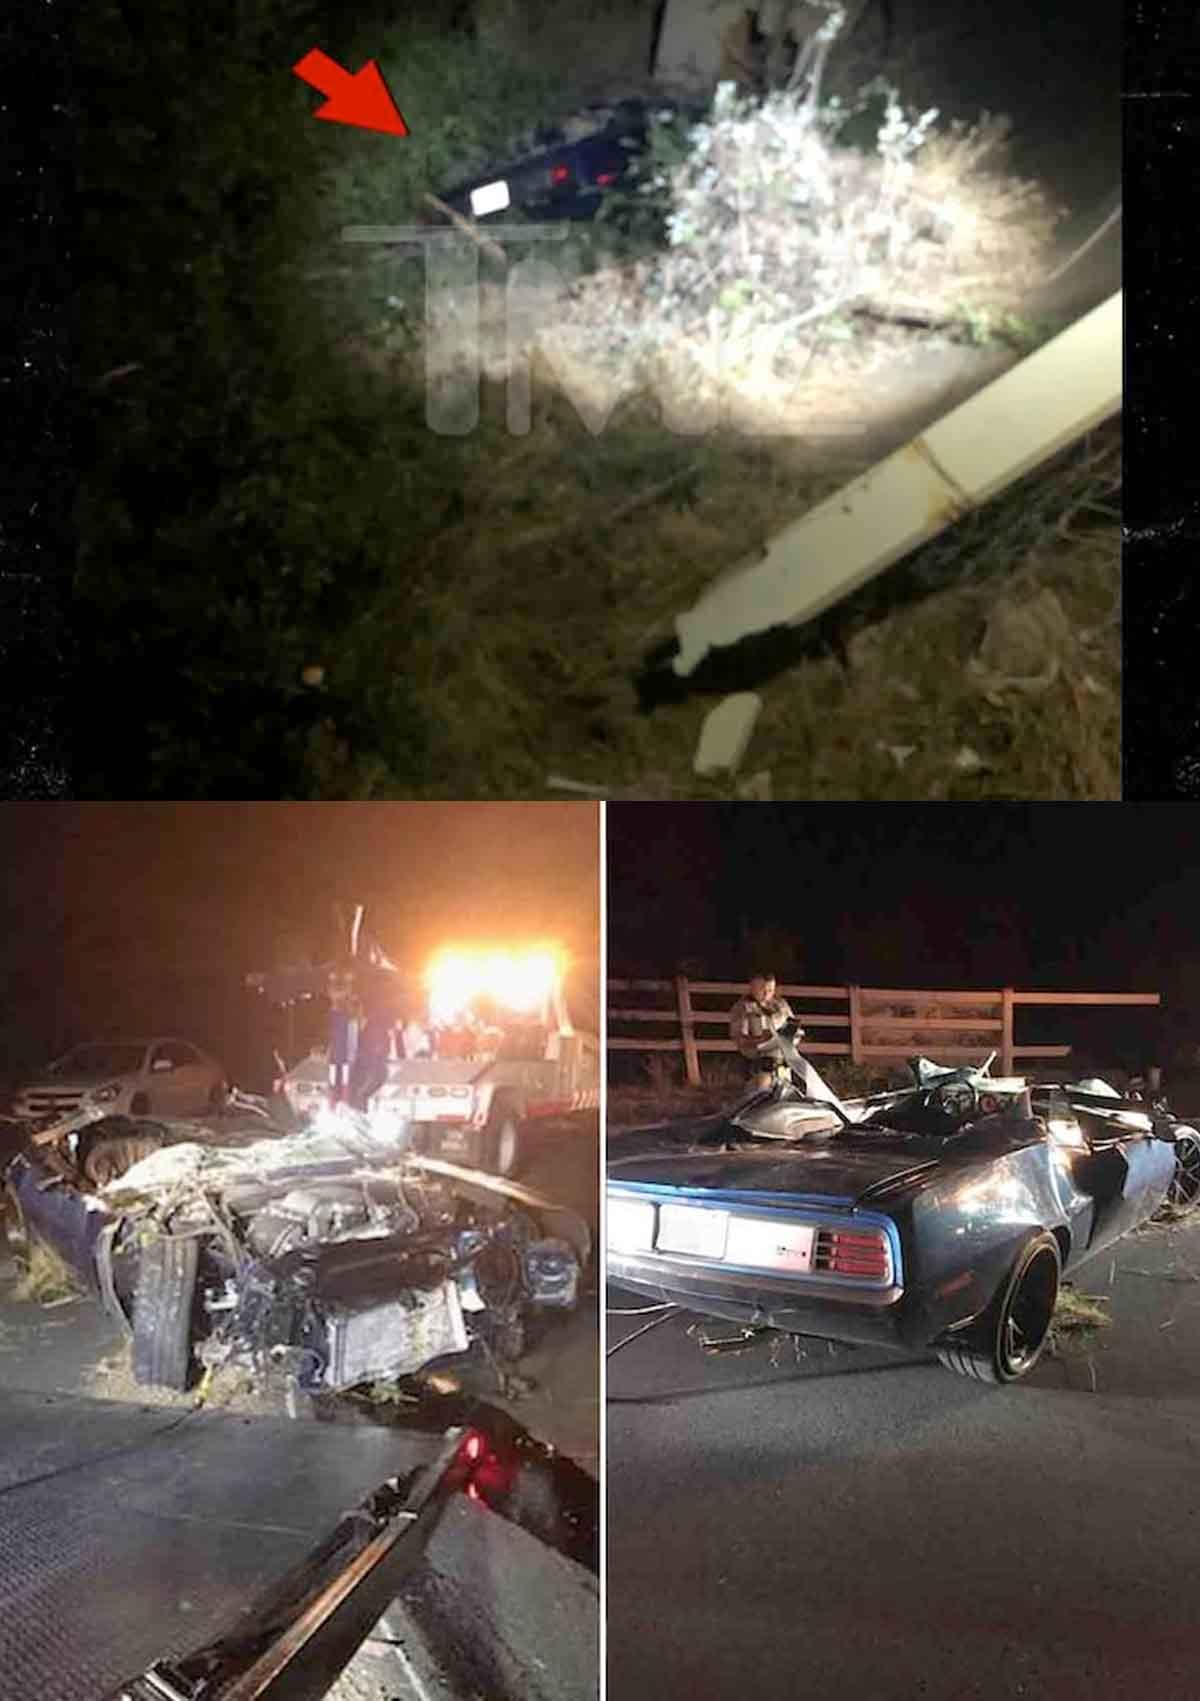 Kevin Hart casi muere en un accidente de coche